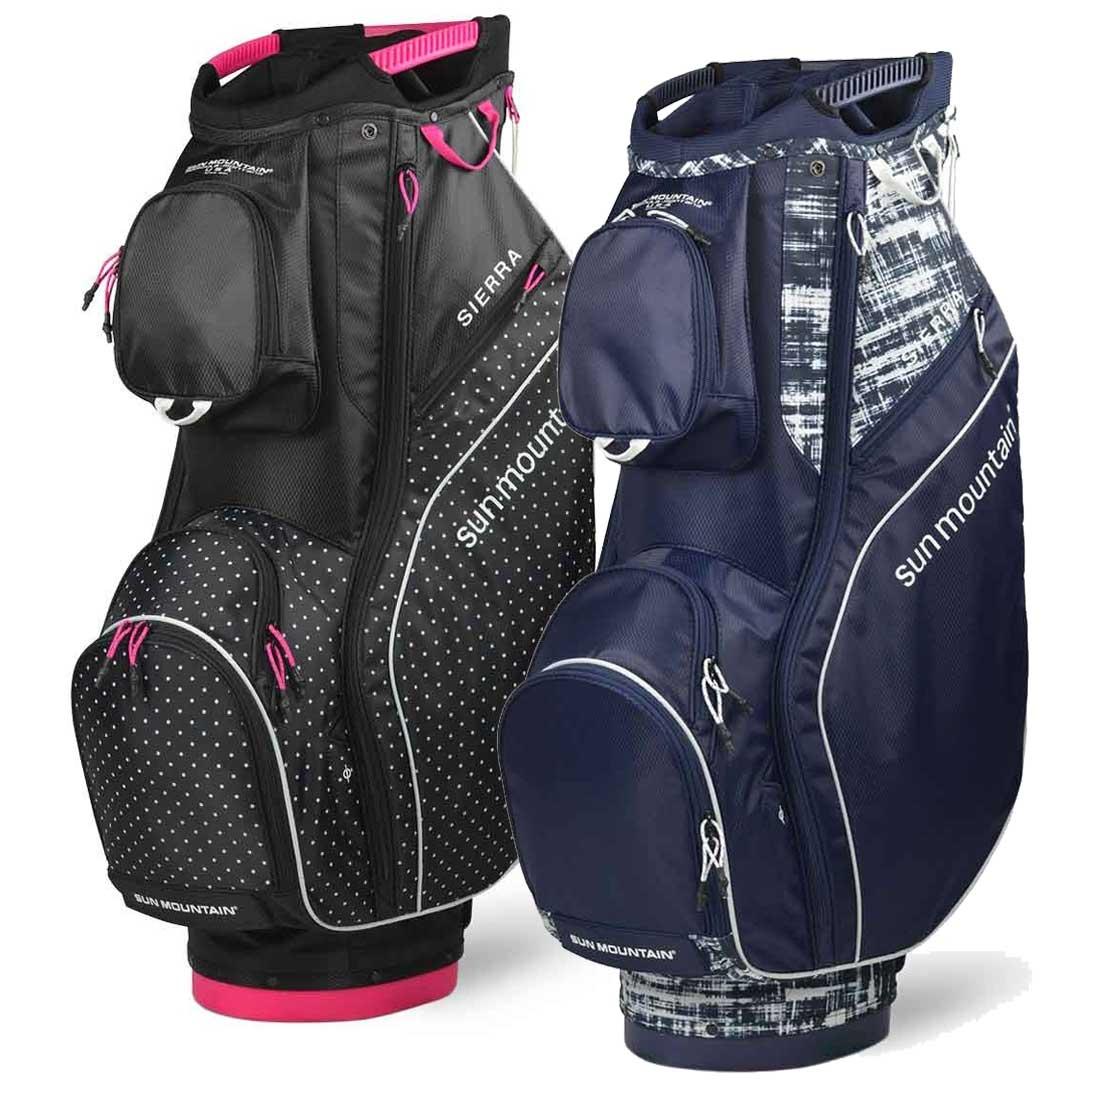 Sun Mountain 2020 Women's Sierra Cart Bag